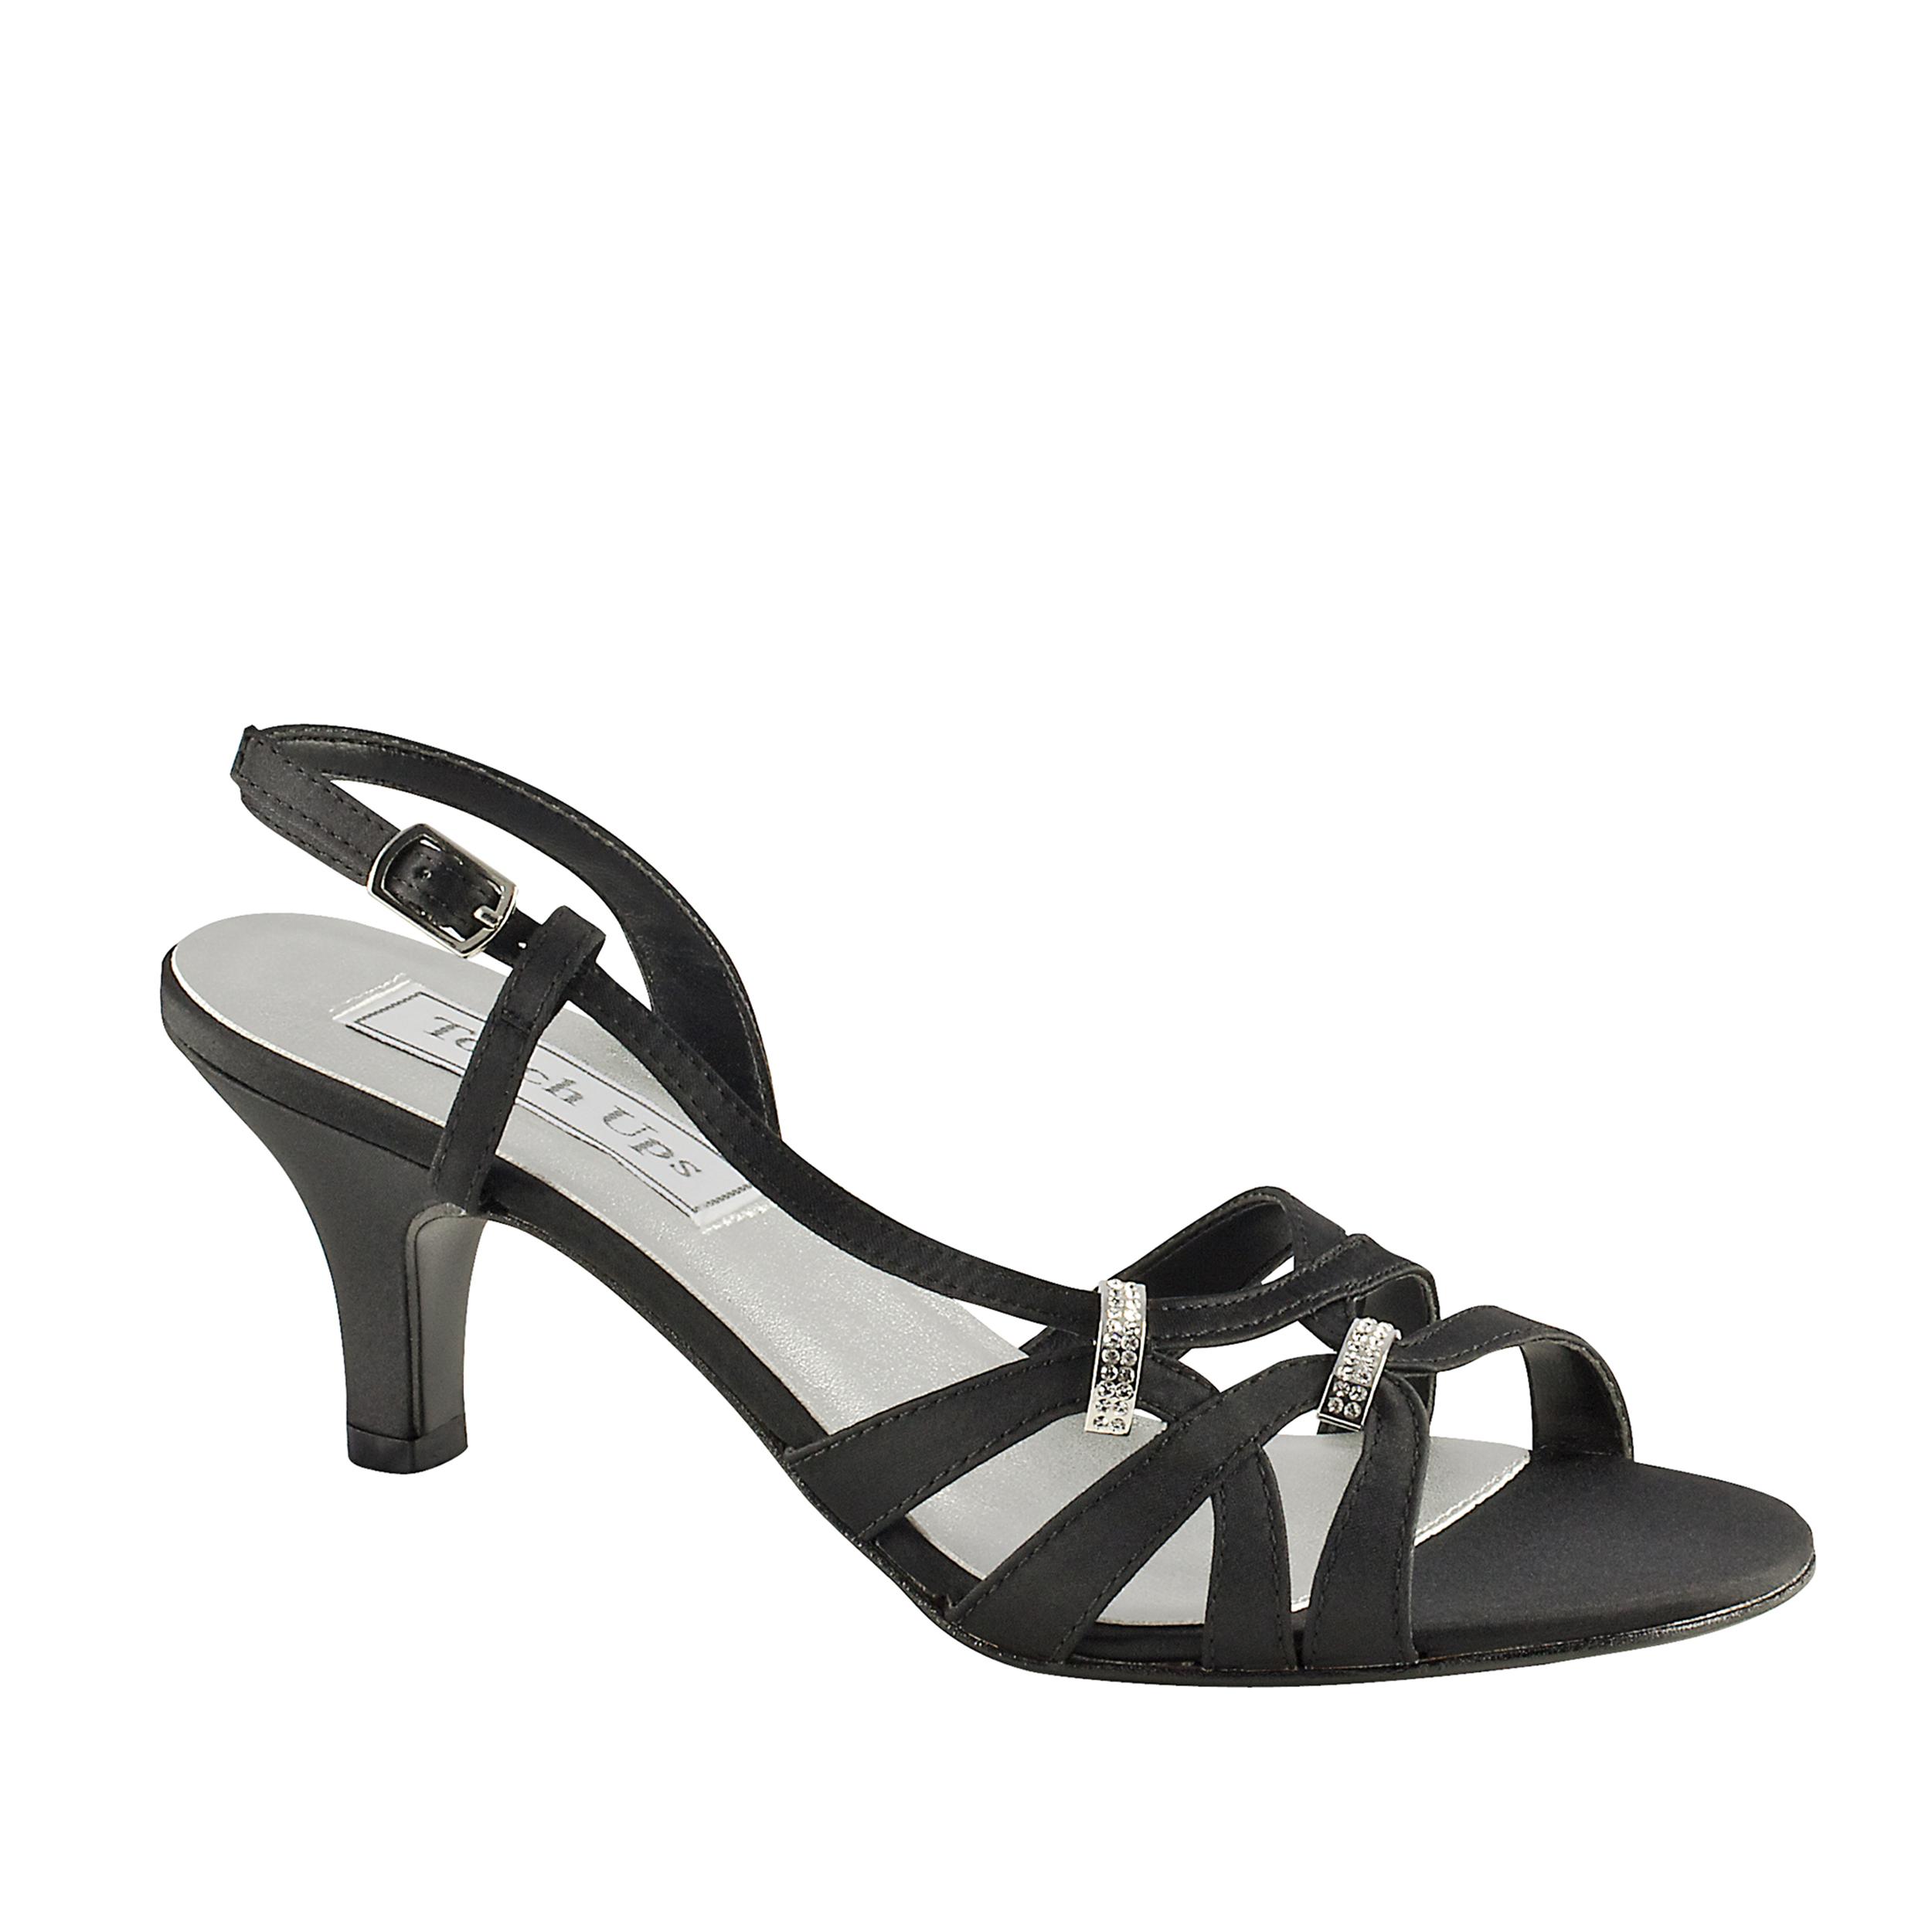 Touch Ups Womens Donetta Leather Slingback Sandal,Black Satin,10 W US